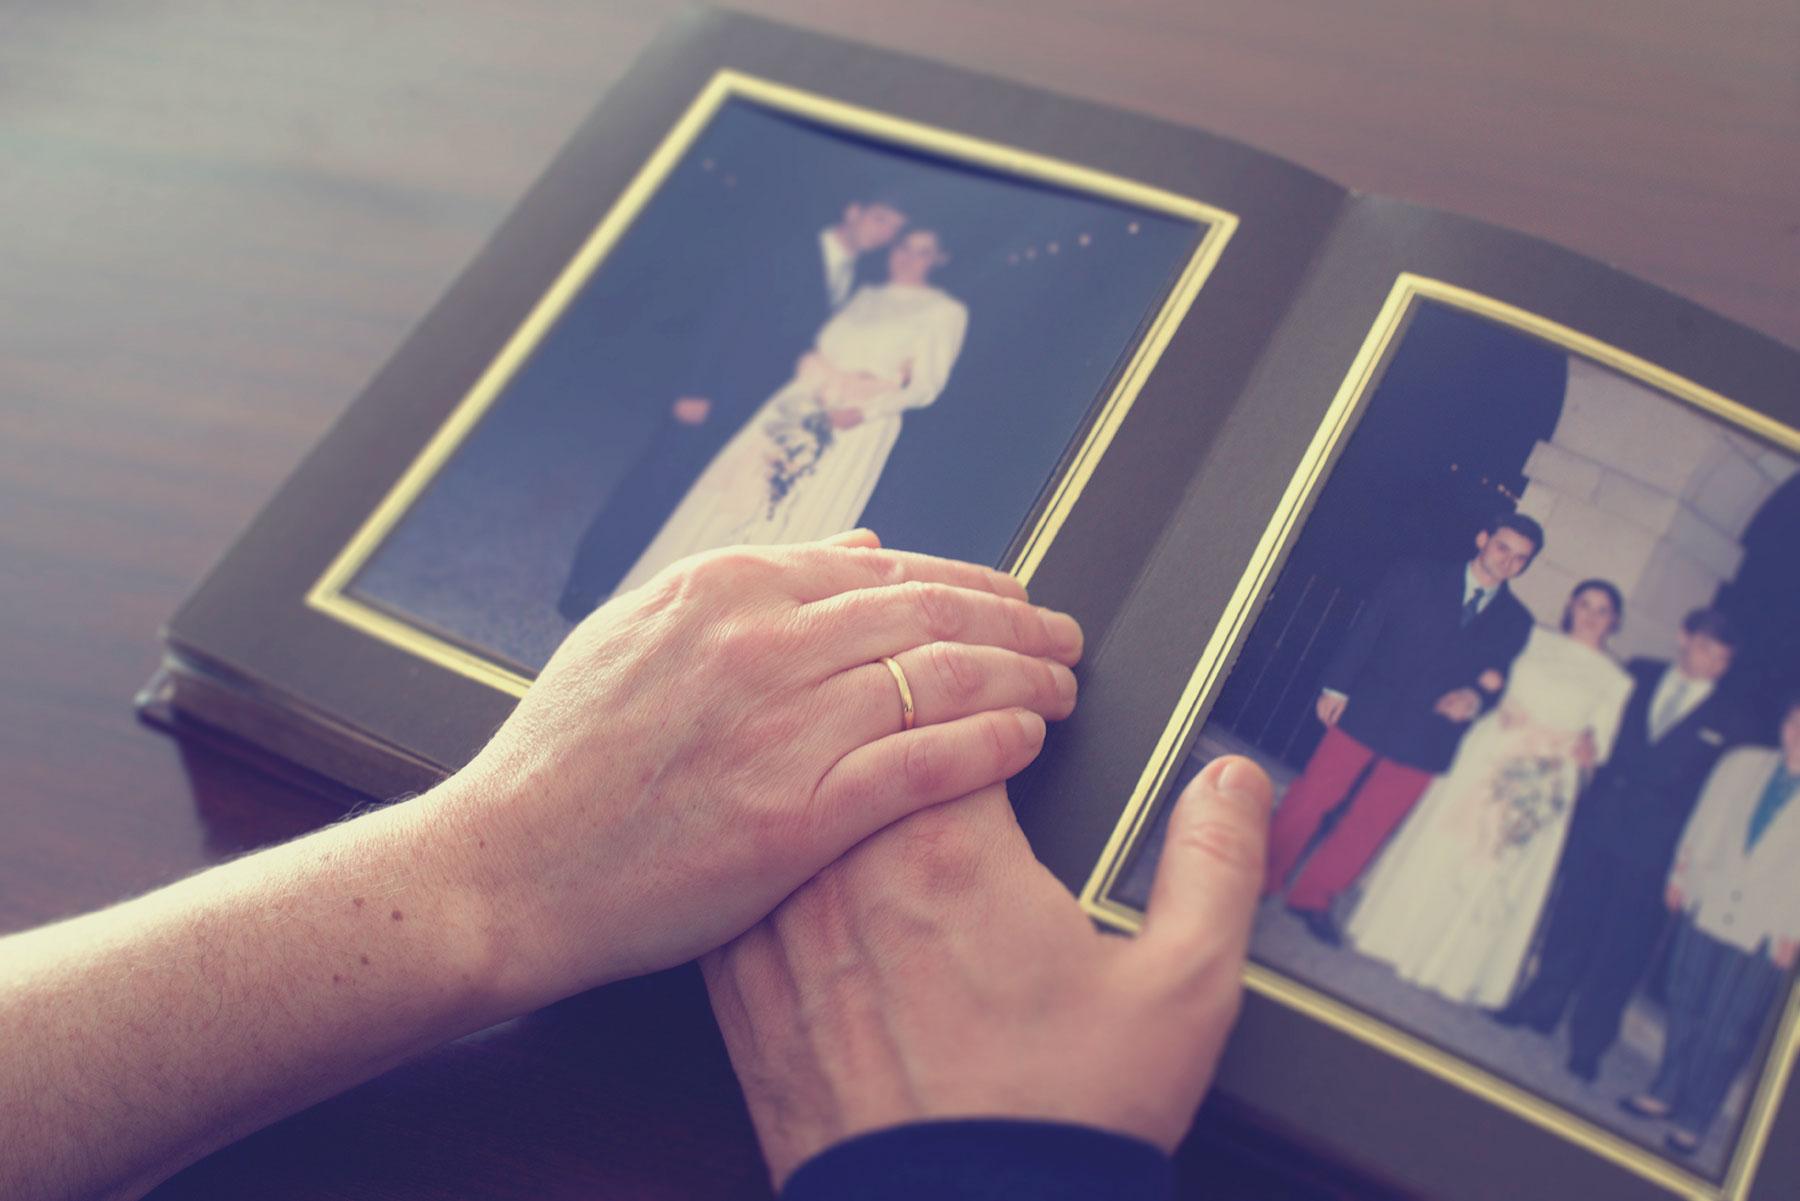 Aniversario boda